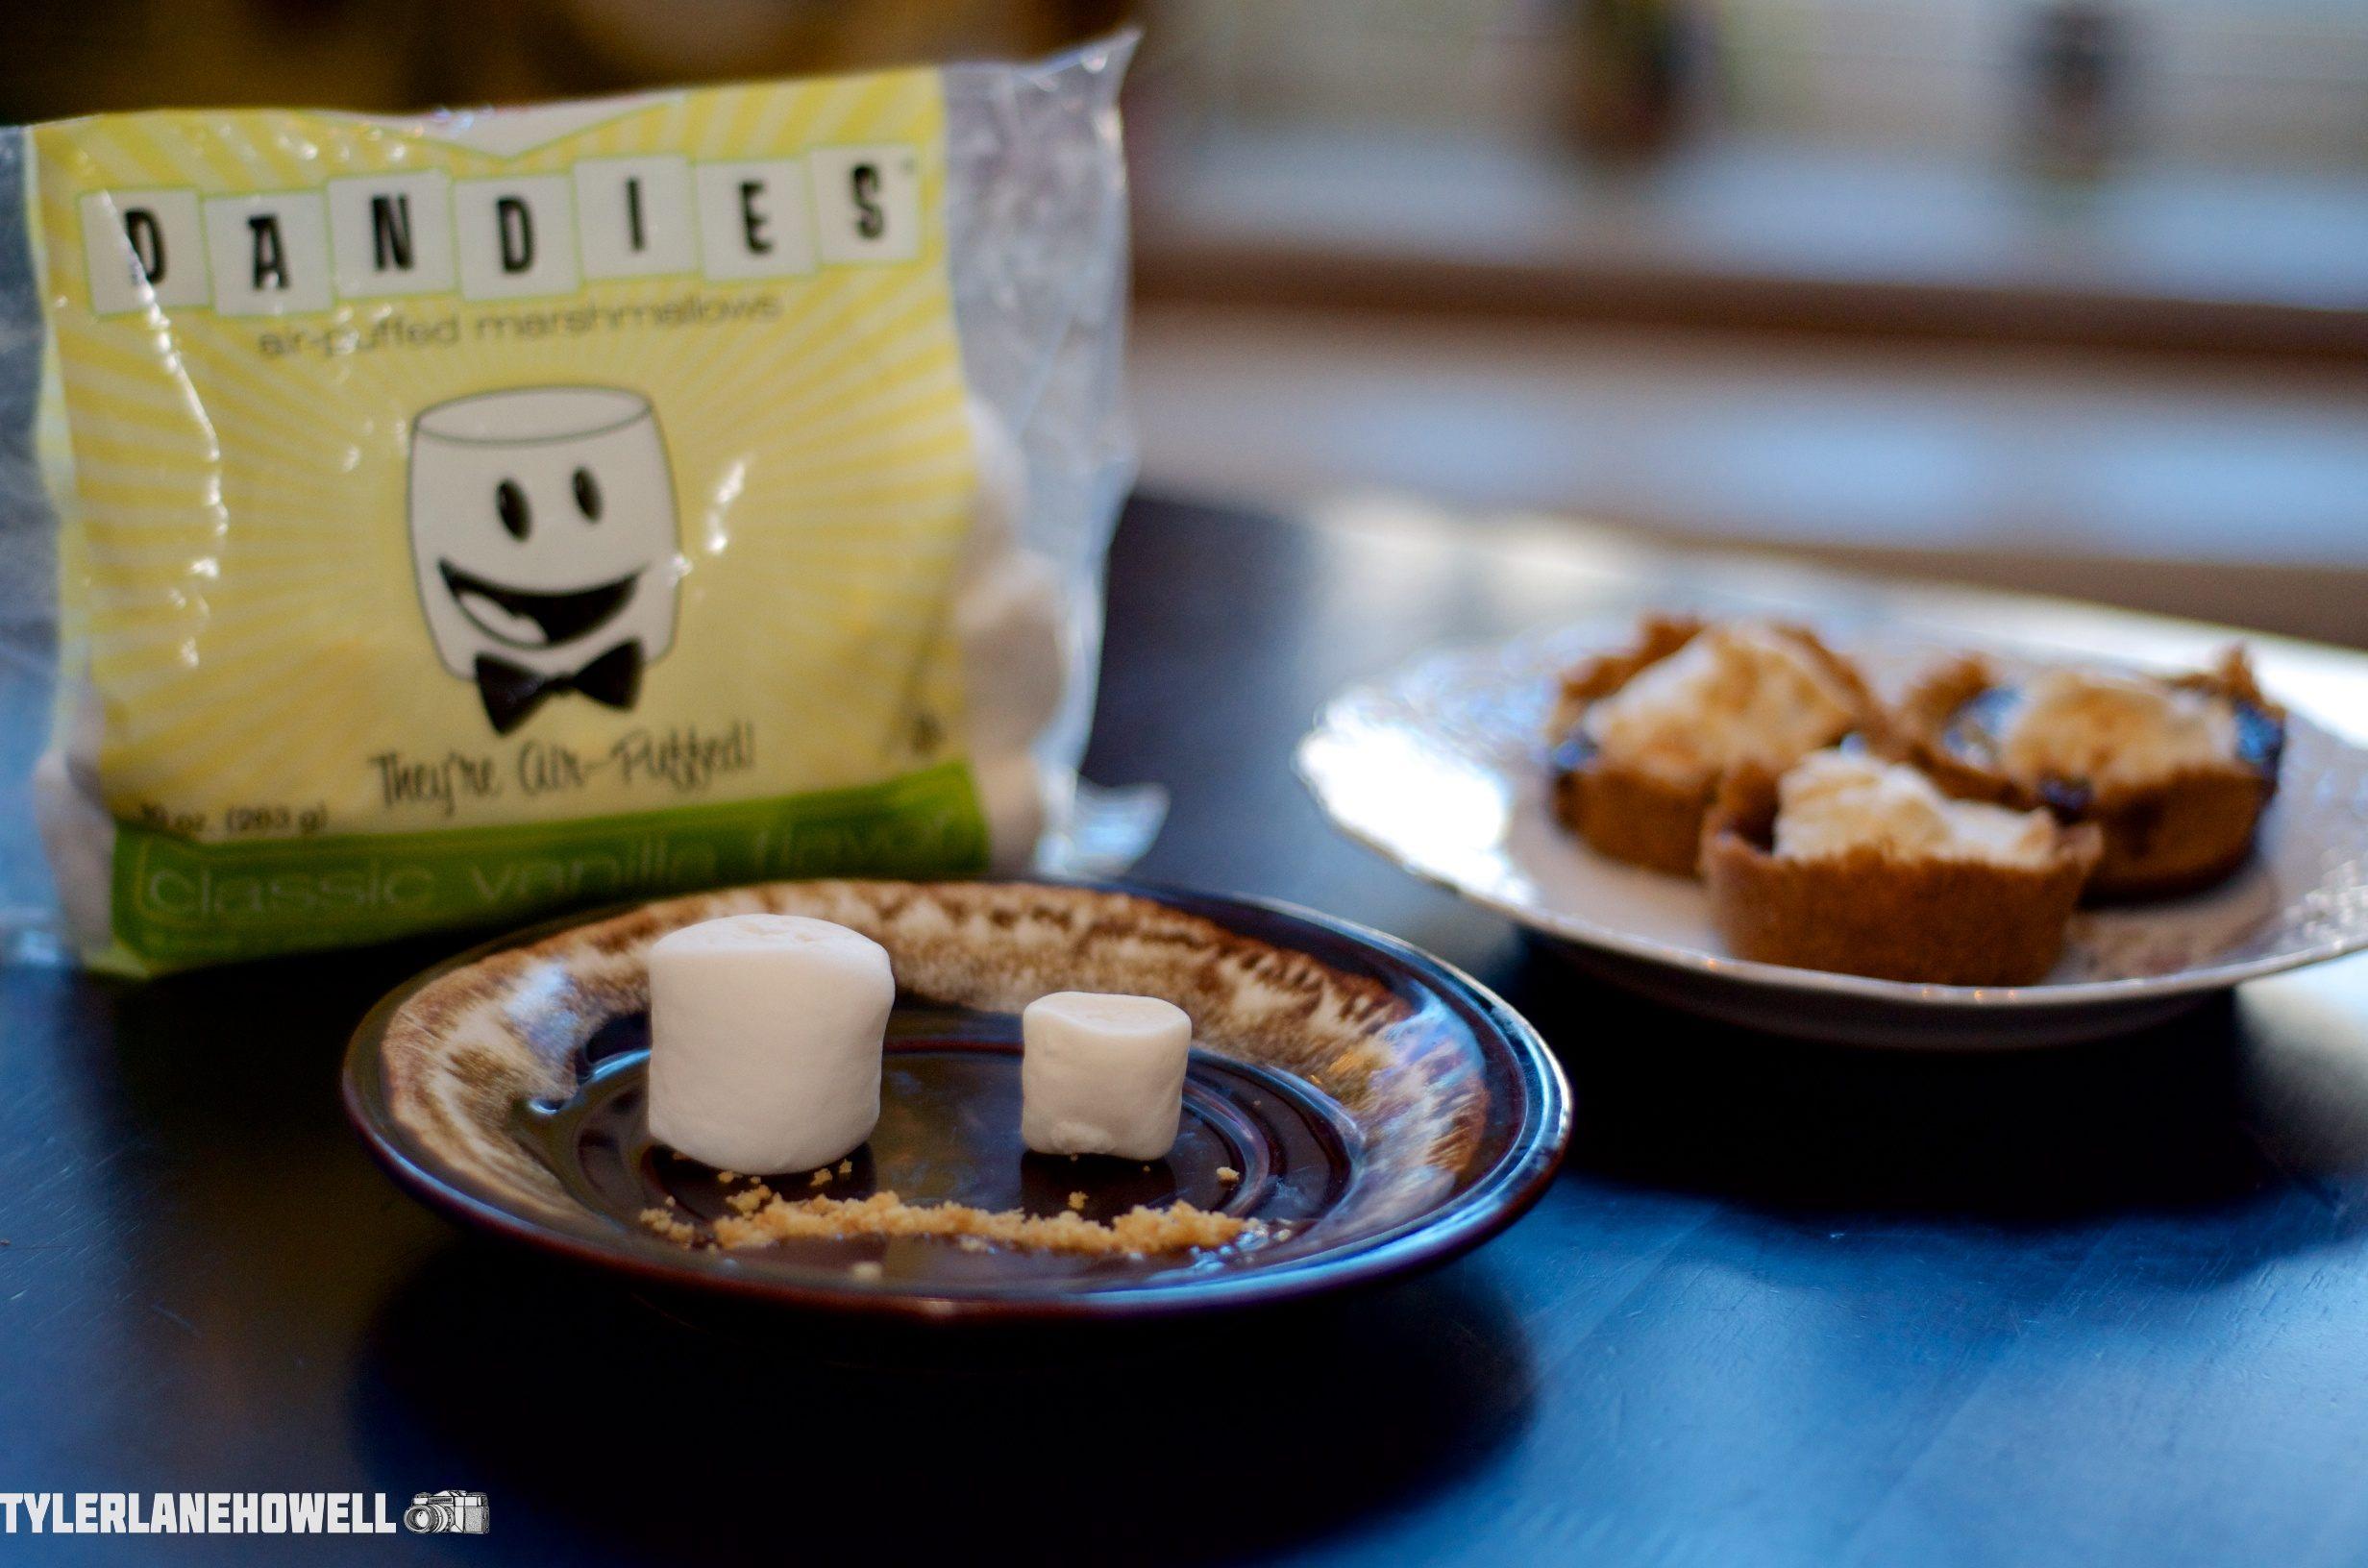 Dandies S'Mores dessert Vegan marshmallows